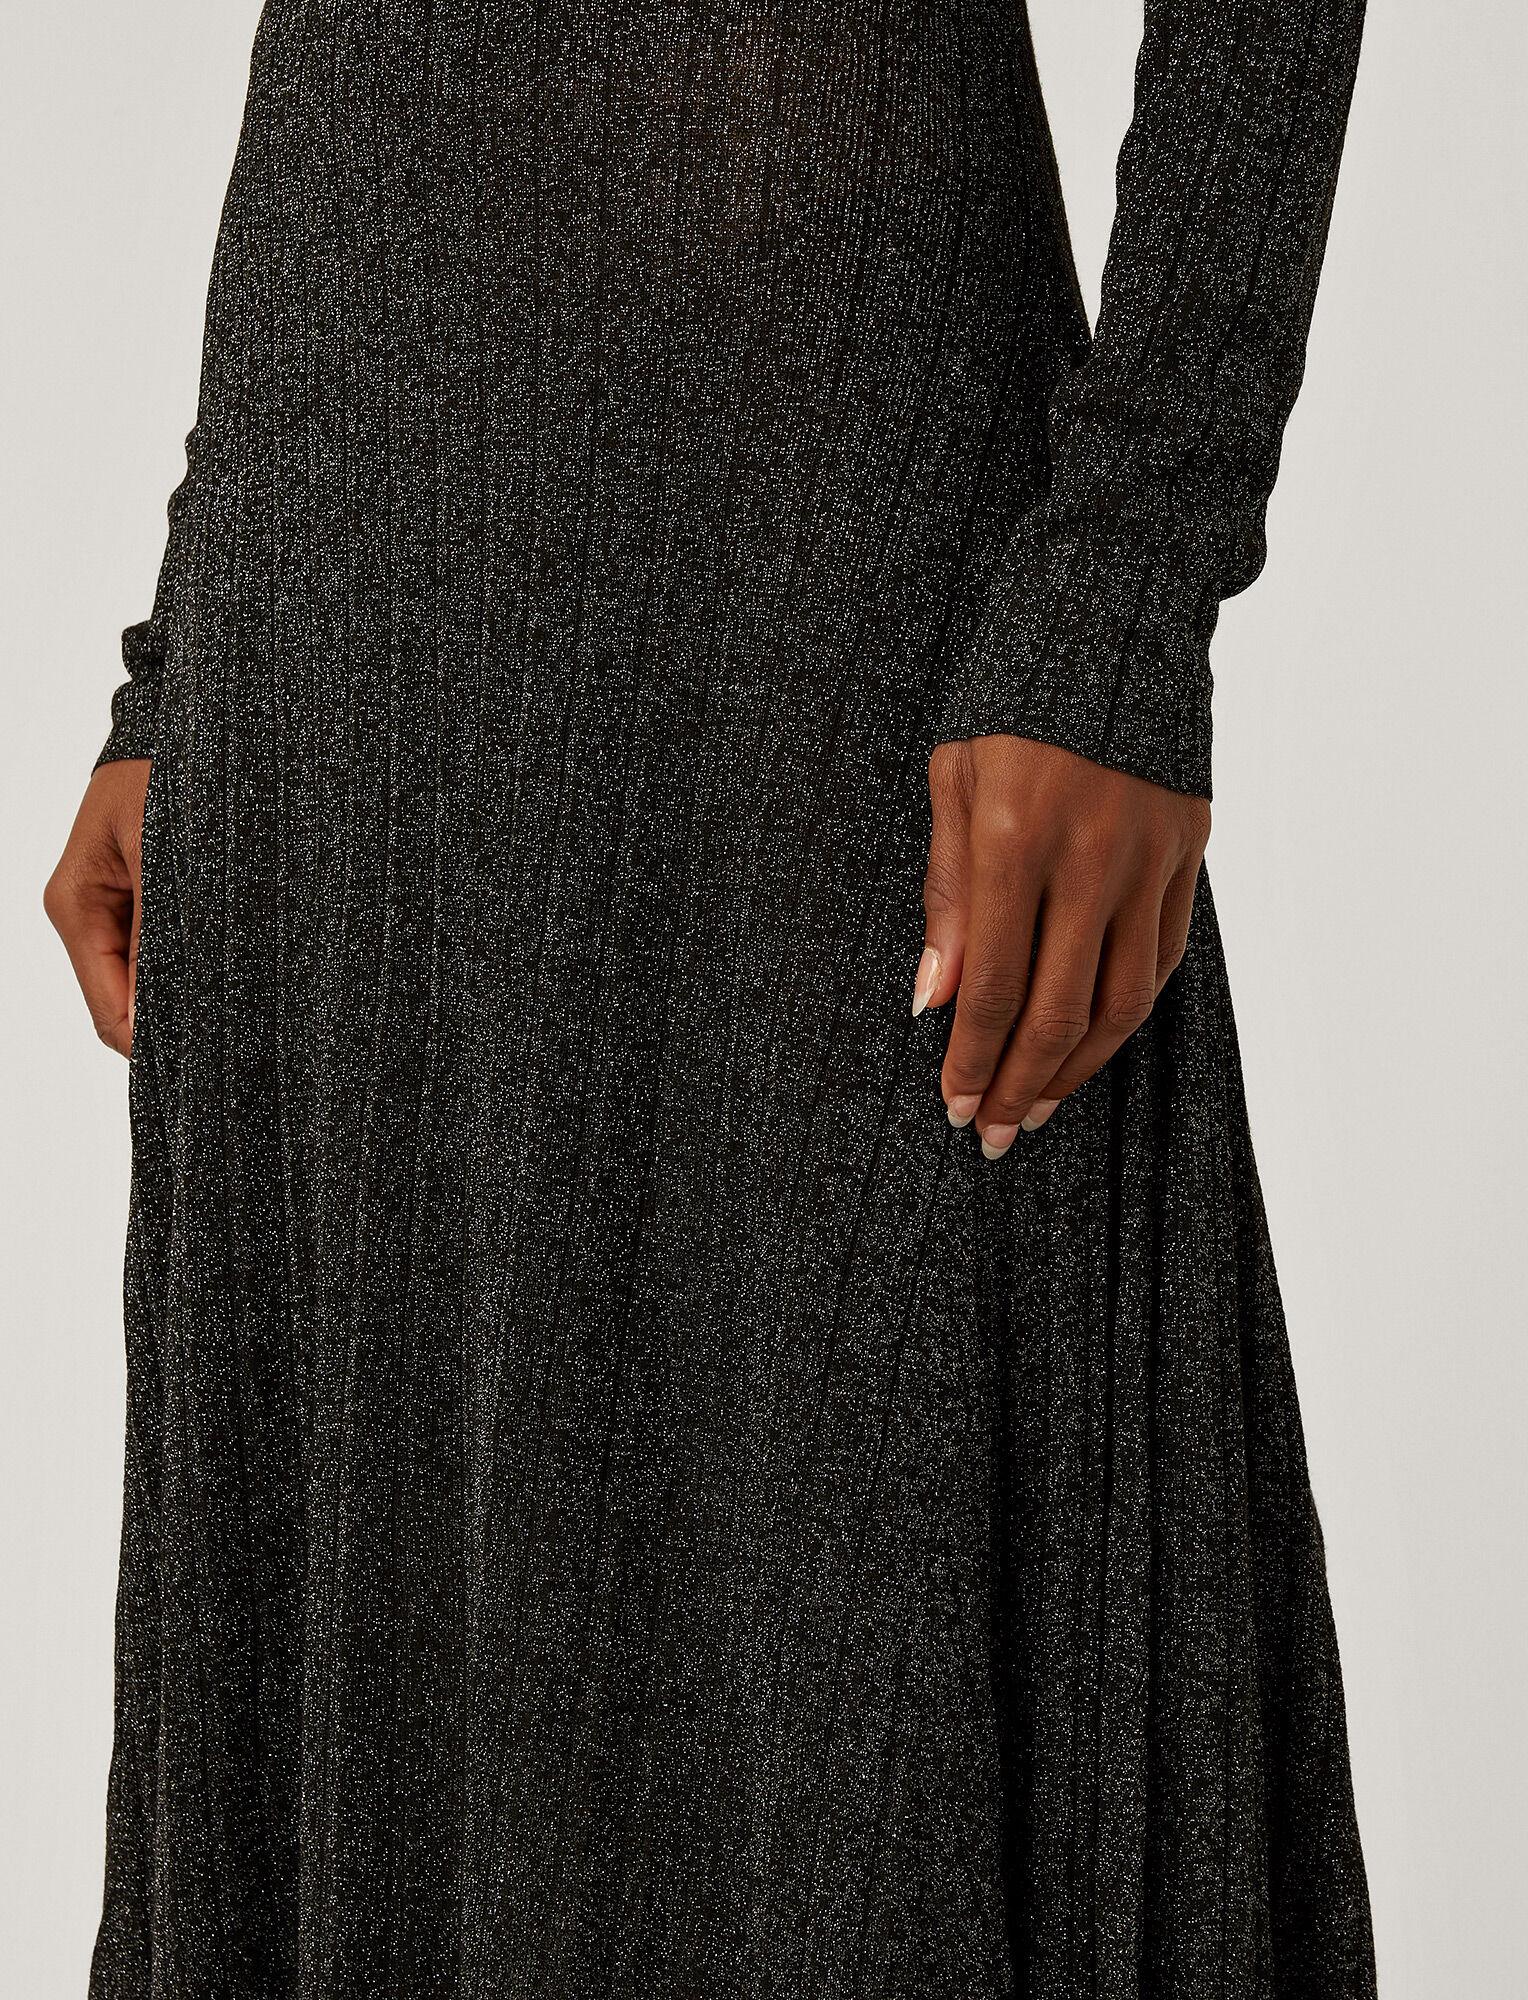 Joseph, Lurex Diva Dress, in BLACK